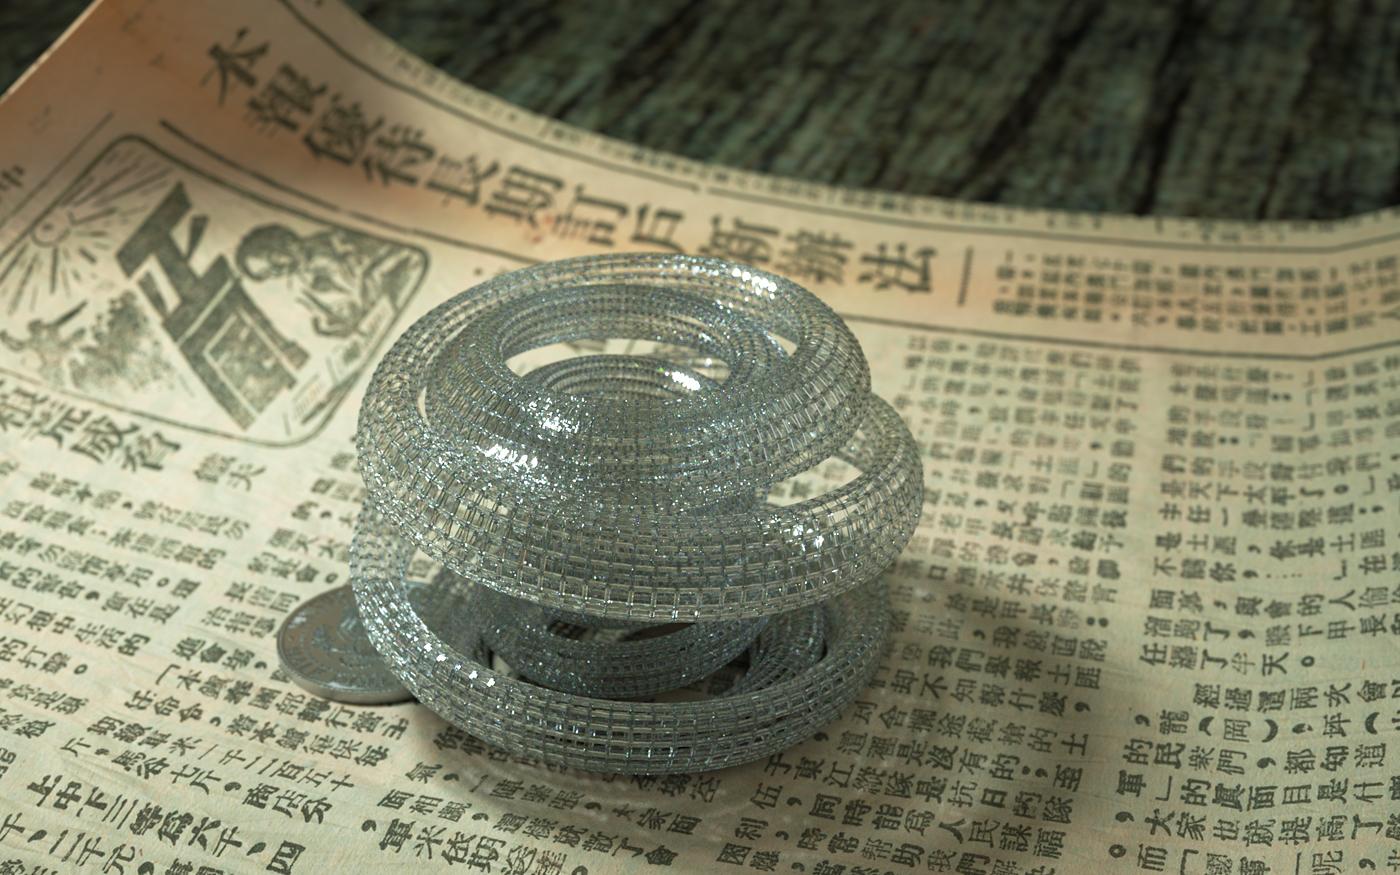 Spiral Sculpture by LuxXeon